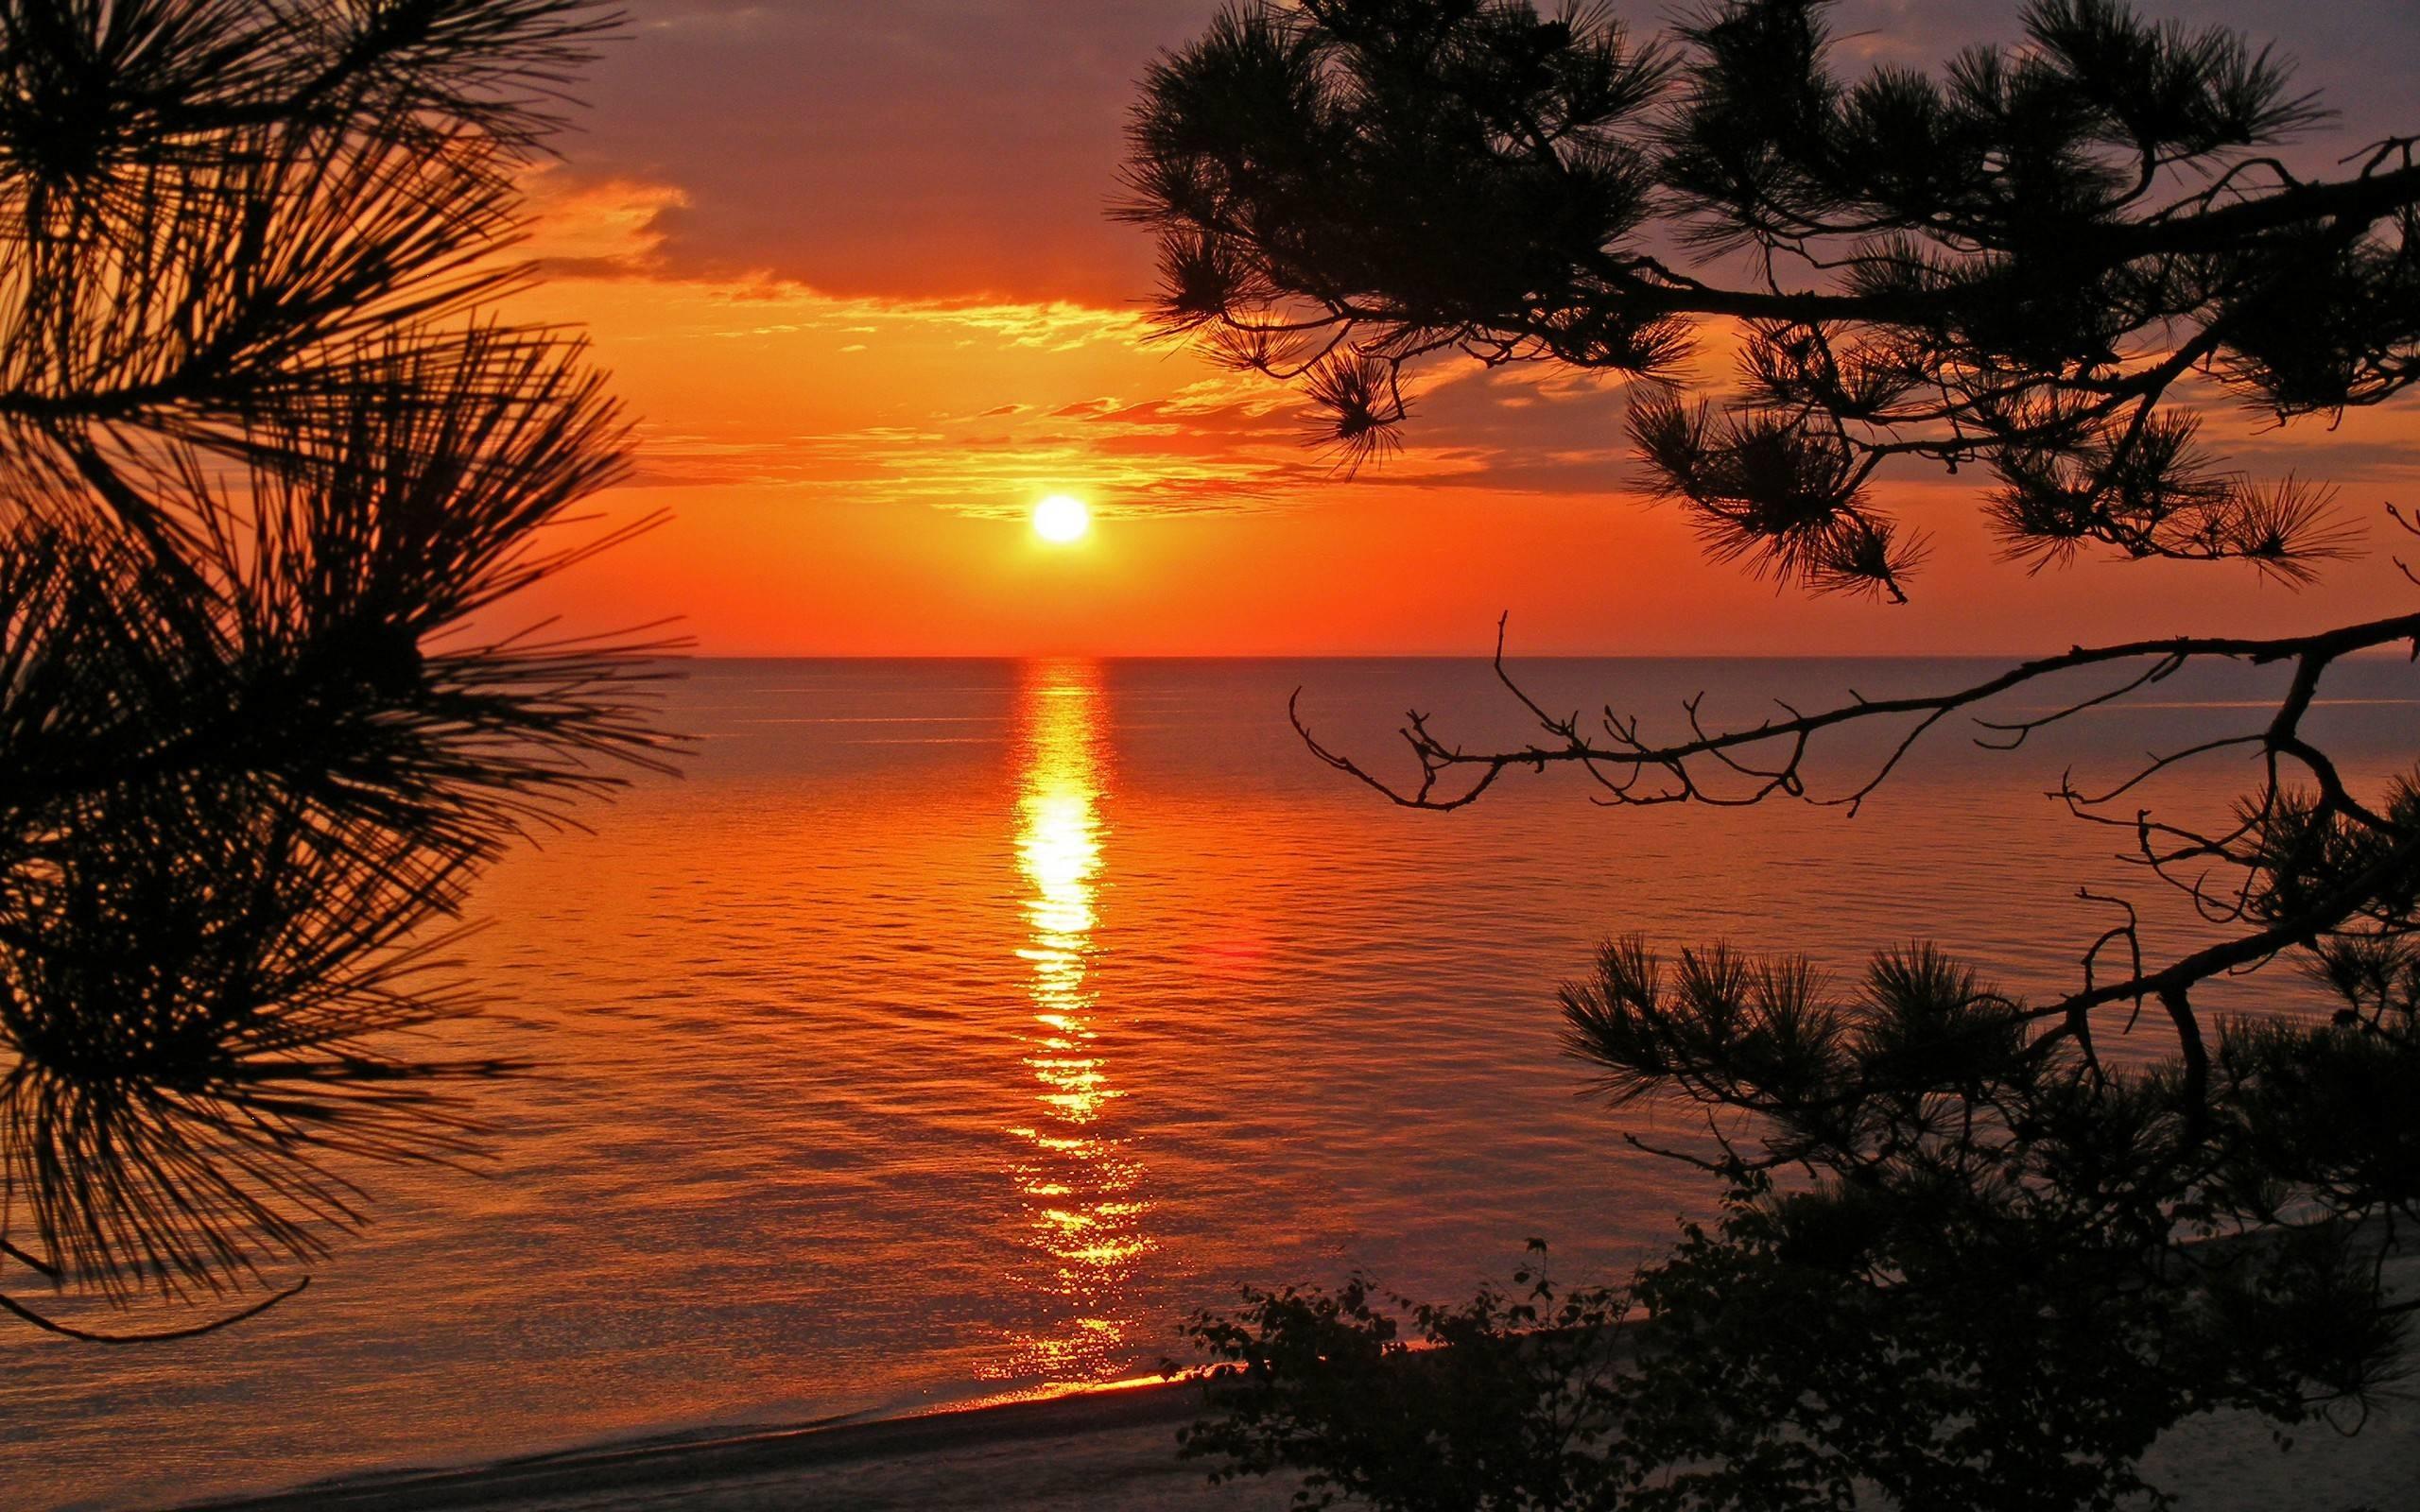 Beach Sunset Wallpaper Hd Hd 1080P 12 HD Wallpapers   Eakai.